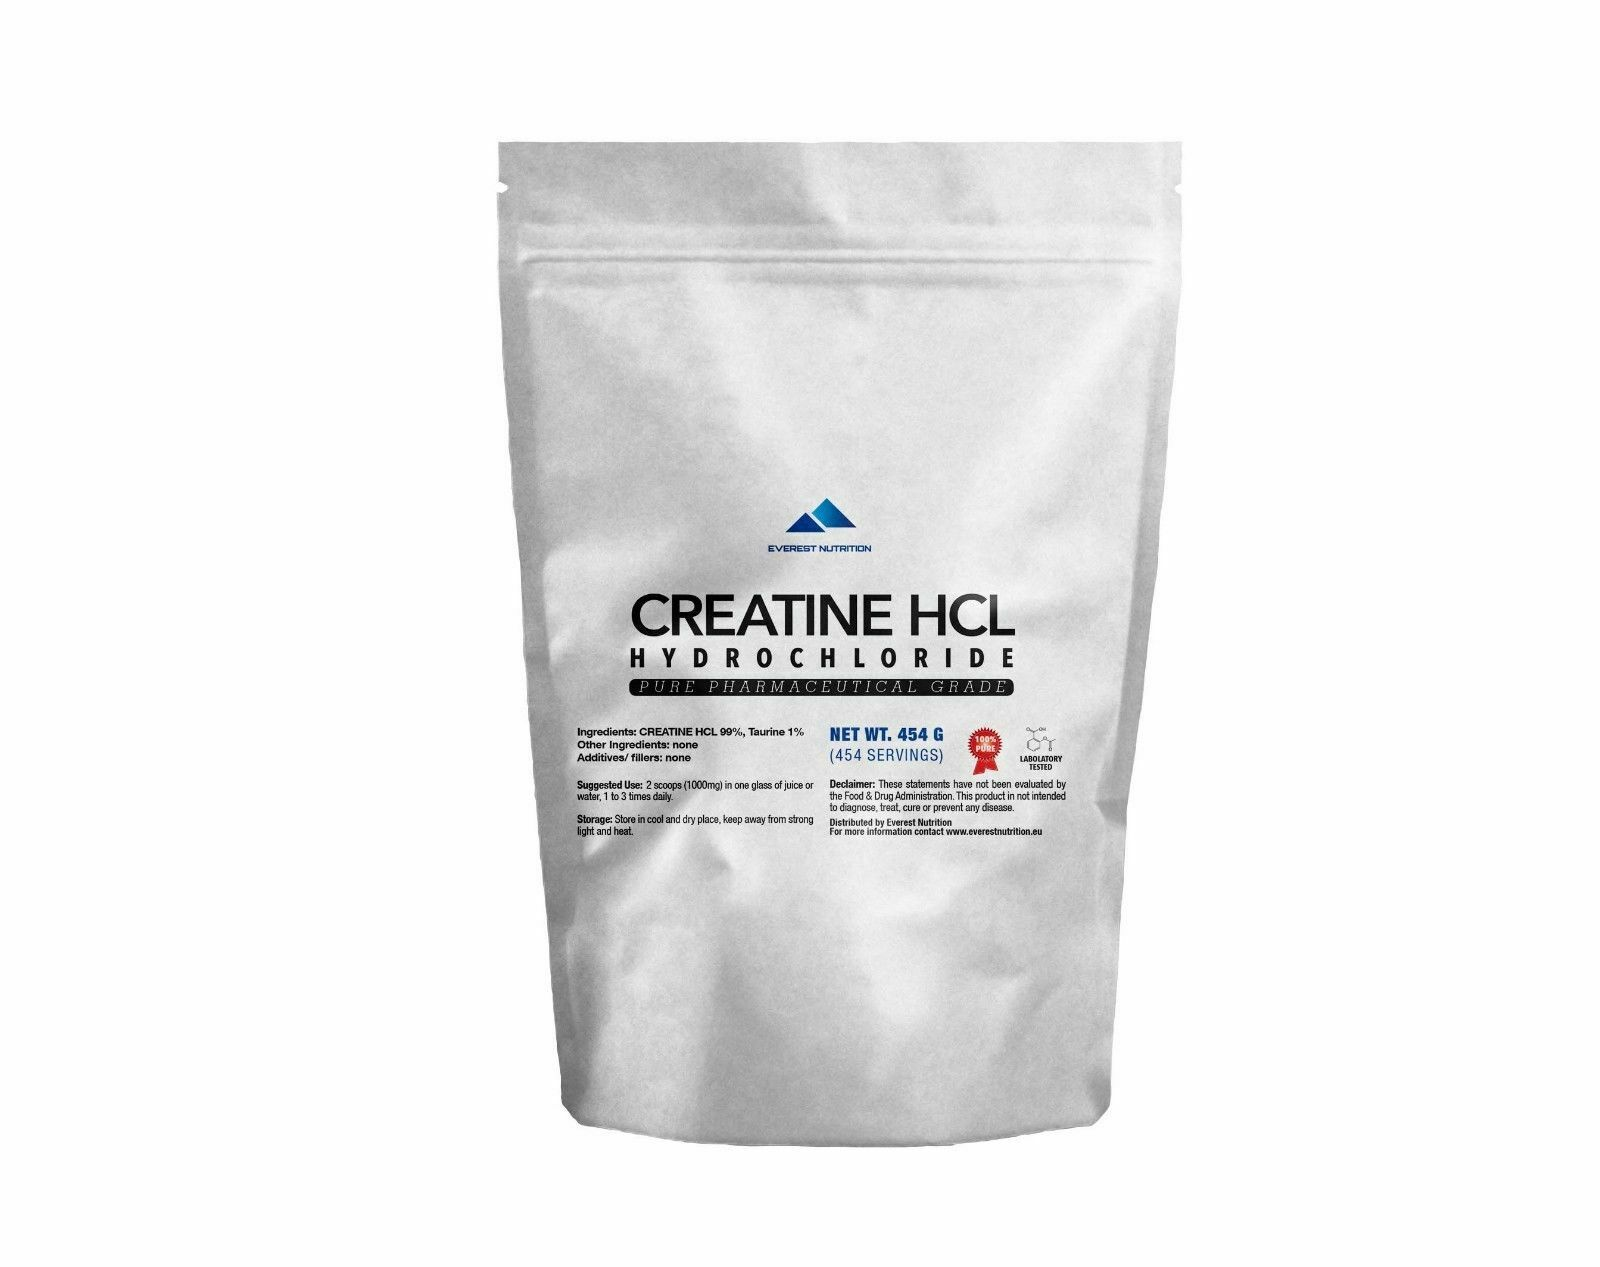 CREATINE HCL HYDROCHLORIDE 100% PURE PHARMACEUTICAL QUALITY POWDER